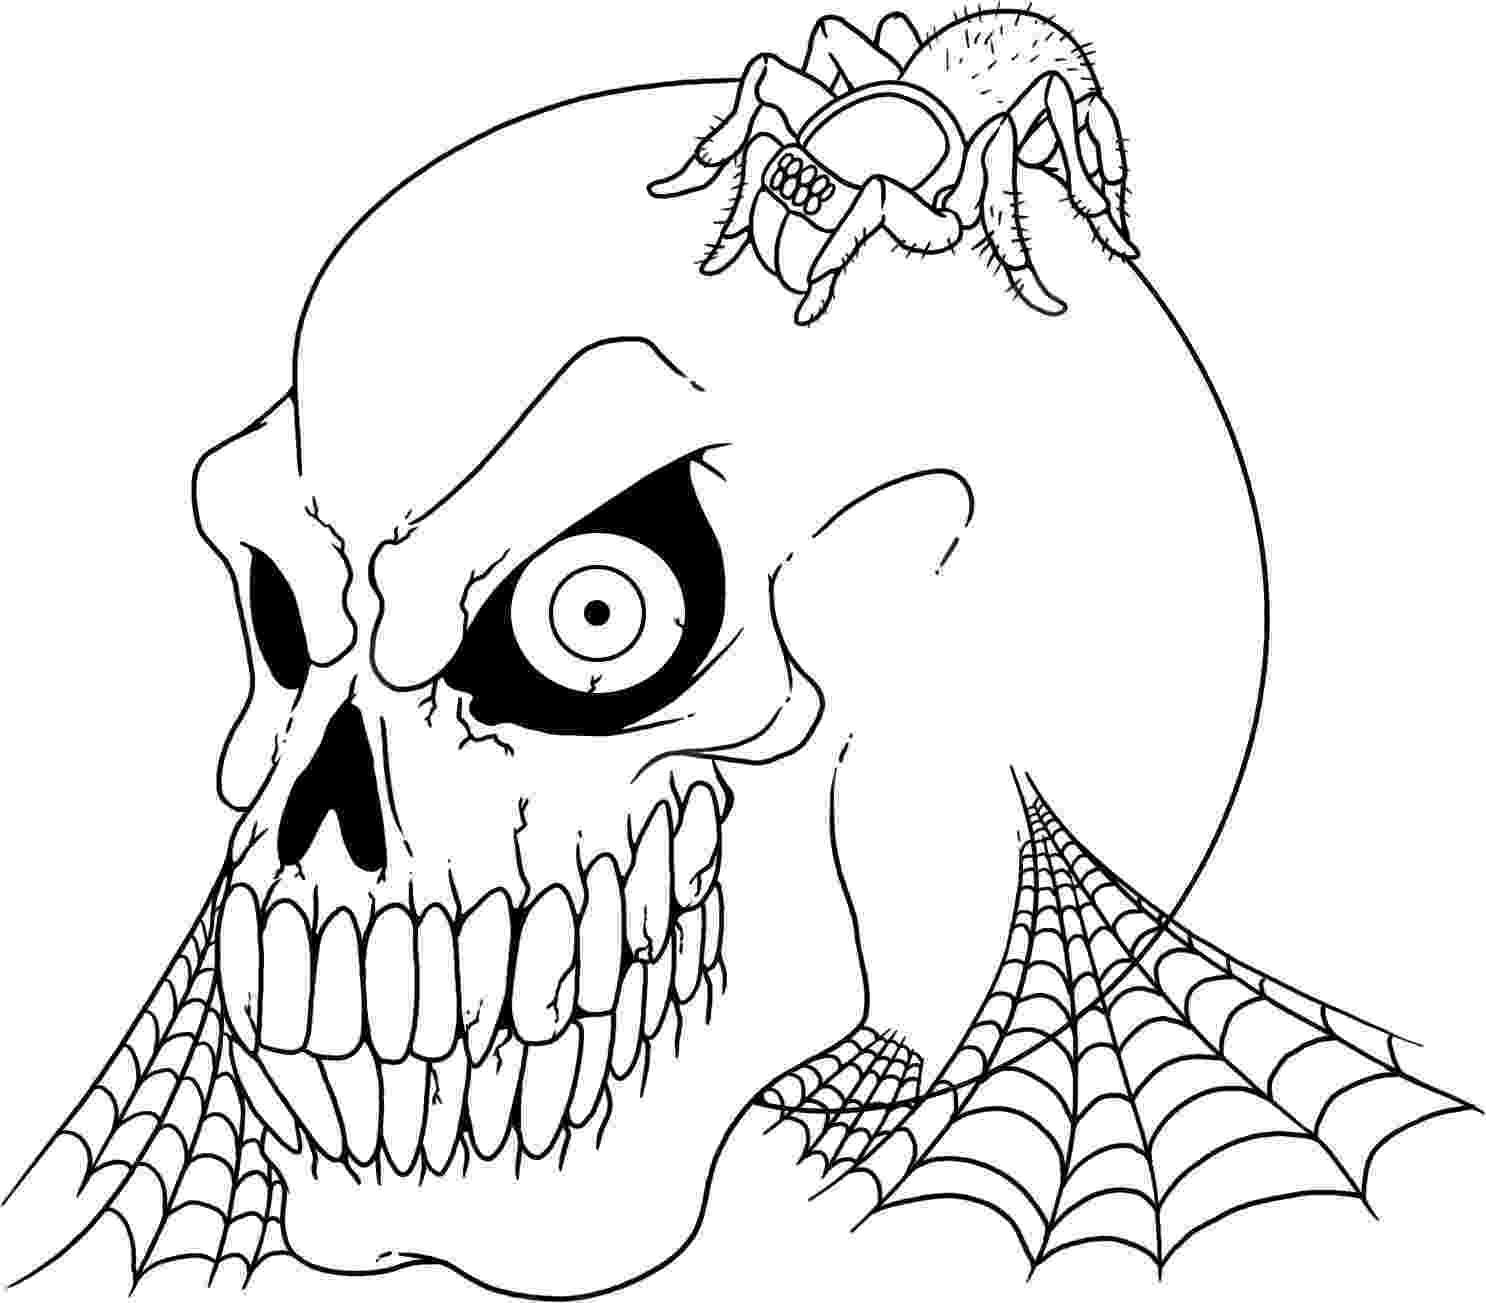 skull coloring sheet free printable skull coloring pages for kids sheet skull coloring 1 1